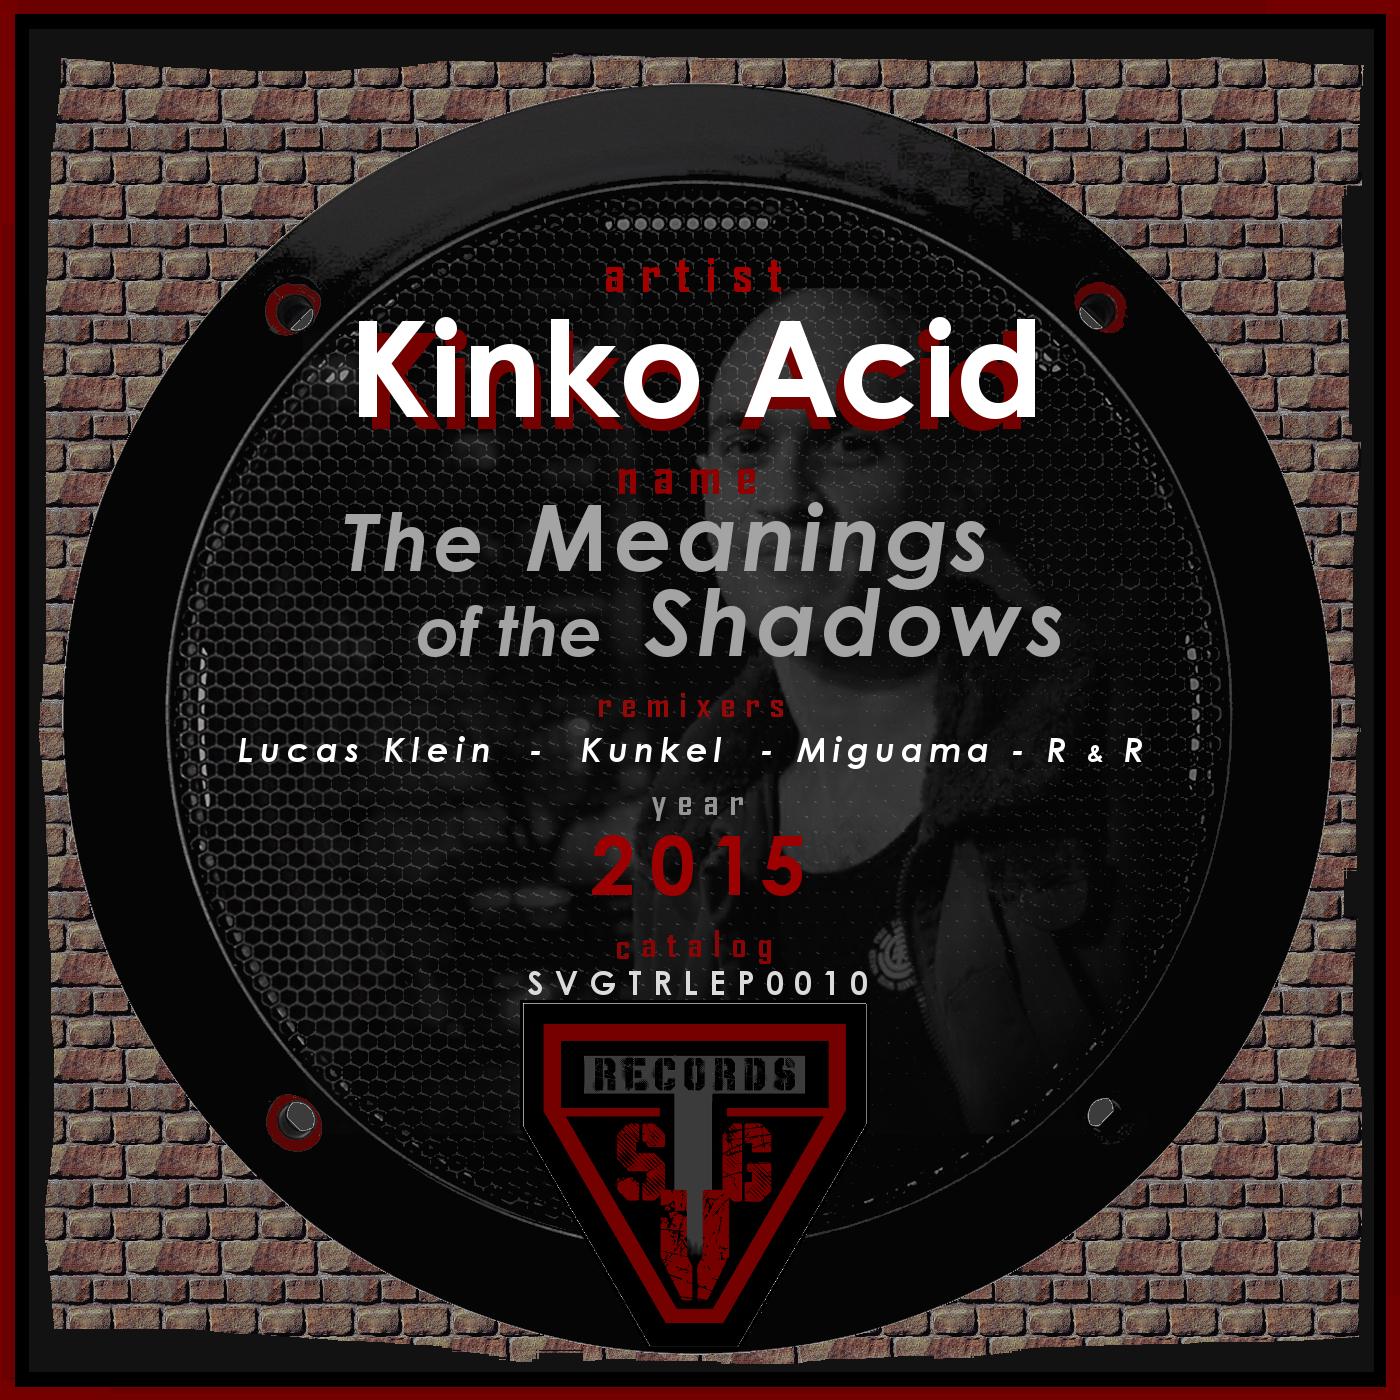 SAVAGE_TR_Cover_ART_1400x1400_Kinko-Acid_Meanings.jpg